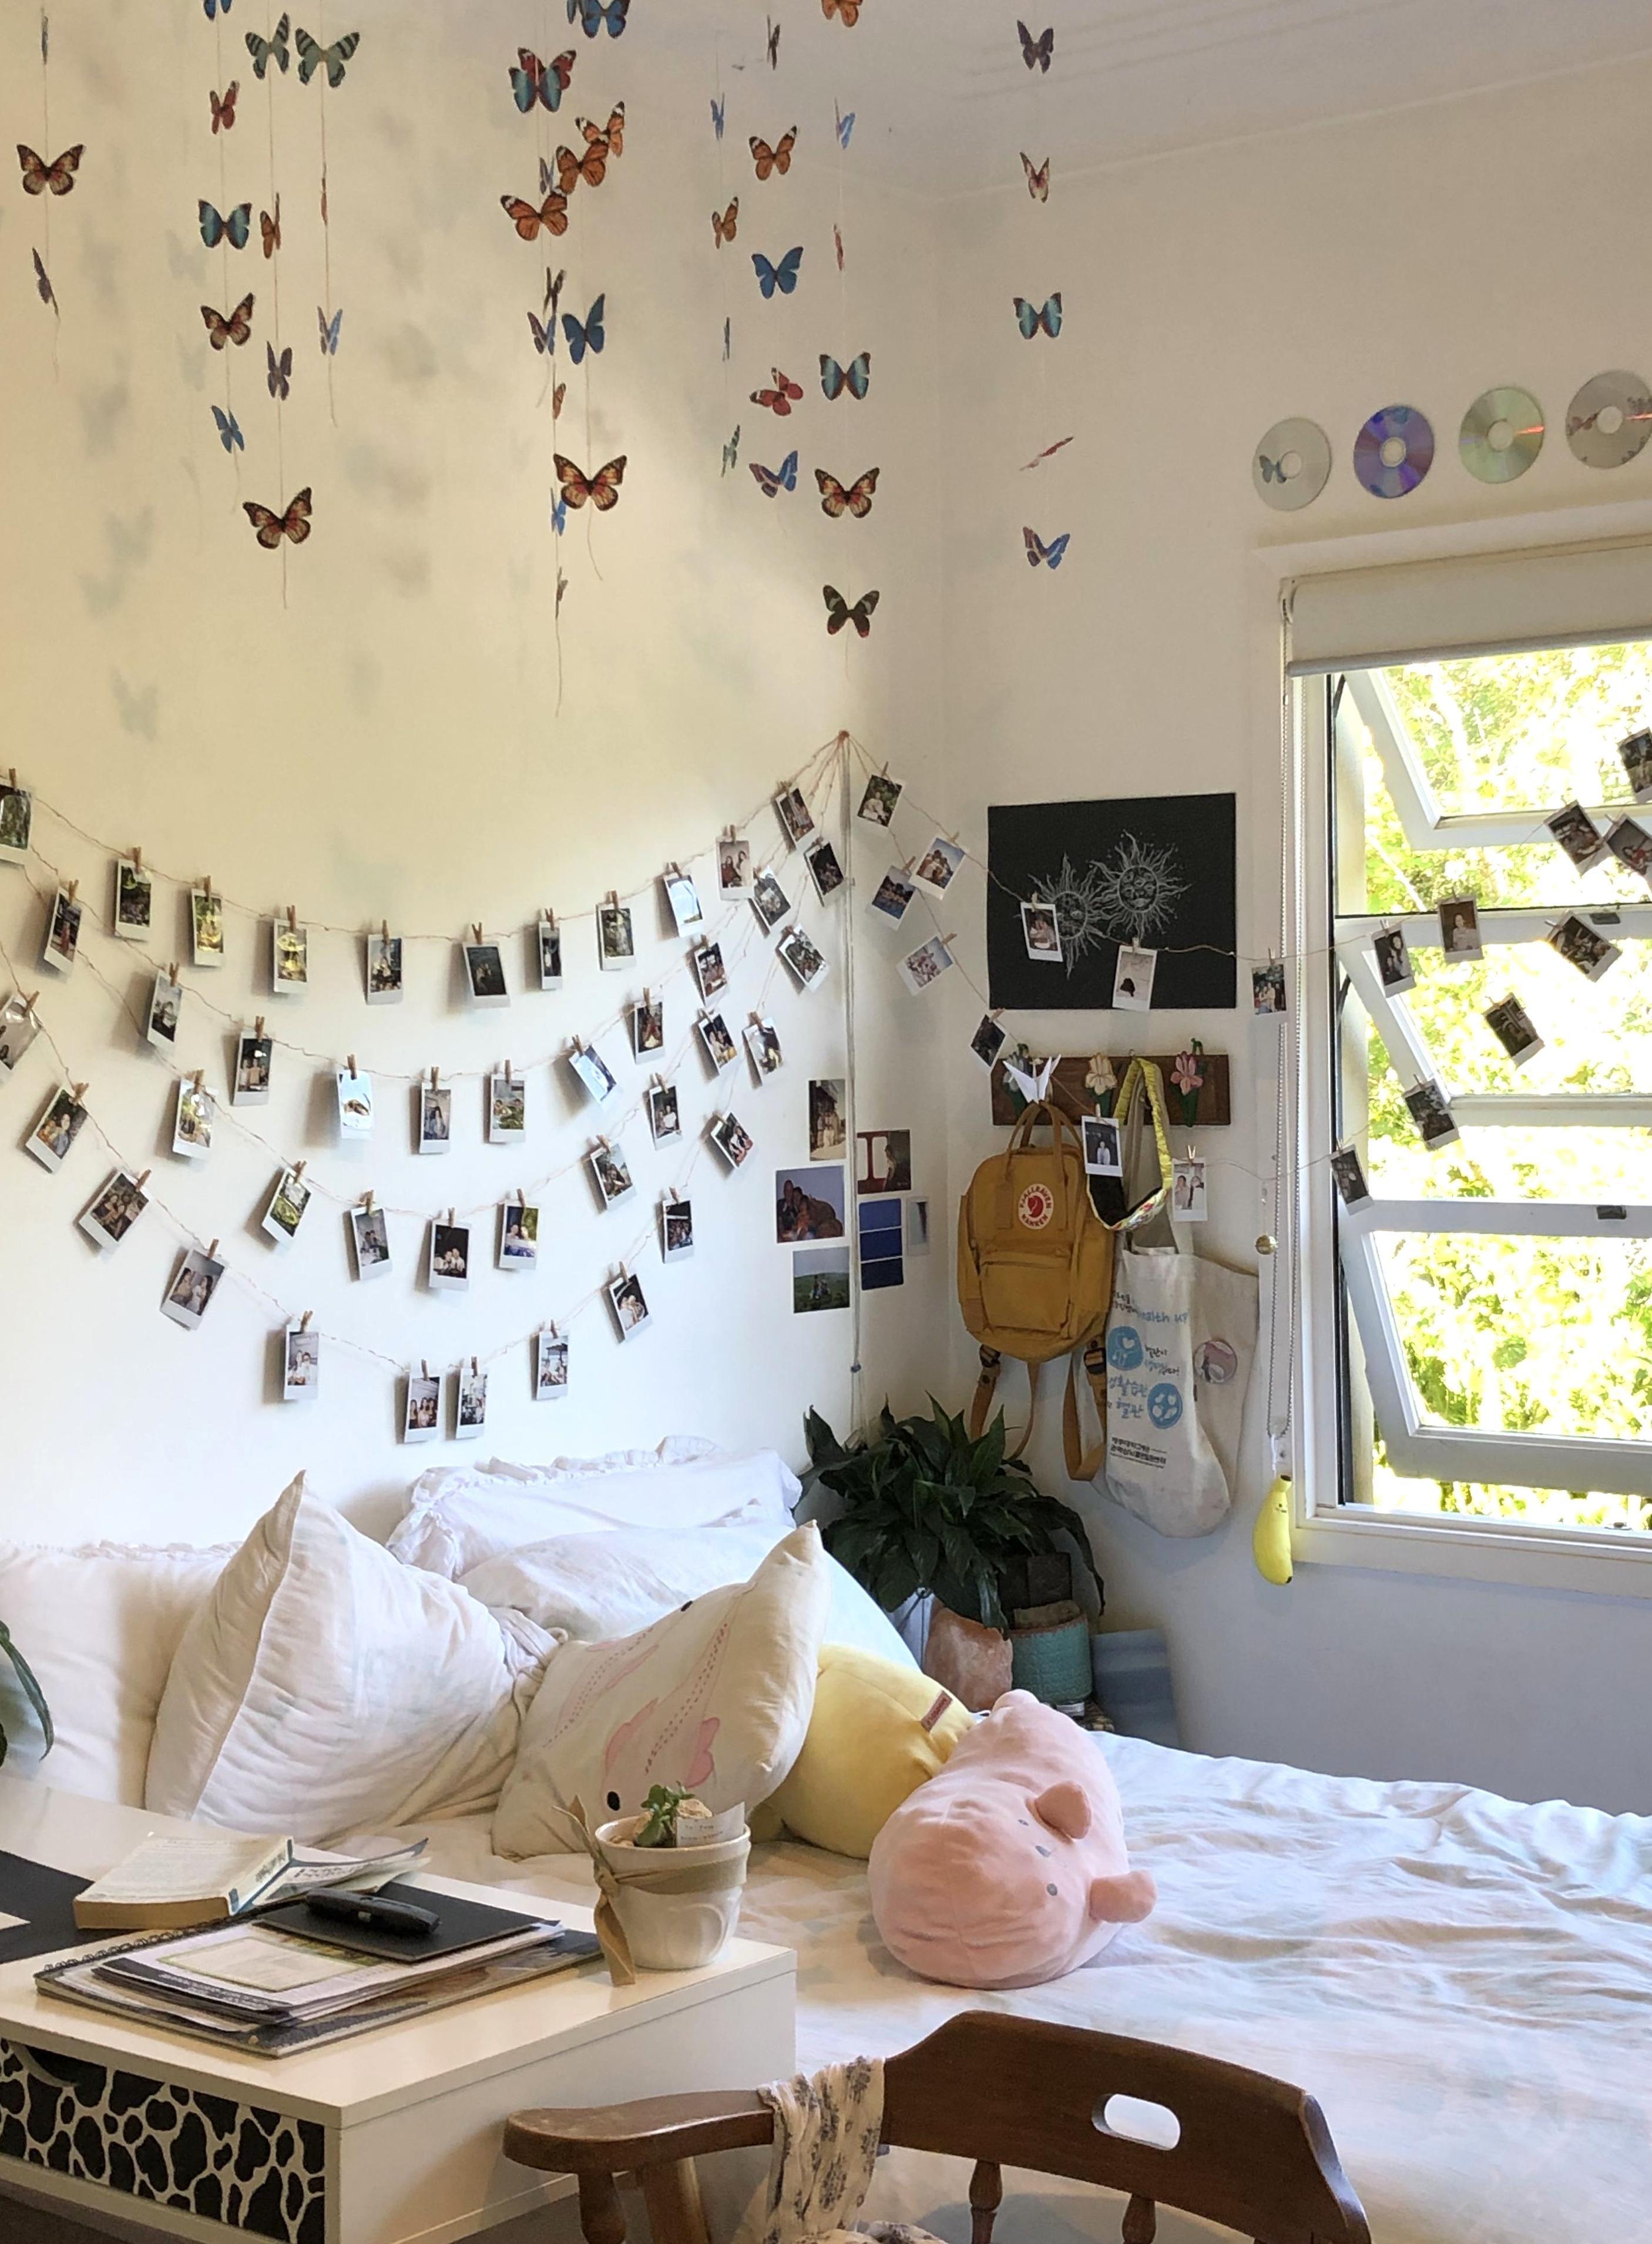 Room Bedroom Aesthetic Sleepover Fairy Lights Kanken Polaroid Wall Room Decor Diy Bedroom Decor Tumblr Retro Ph Retro Room Aesthetic Room Decor Room Wall Decor